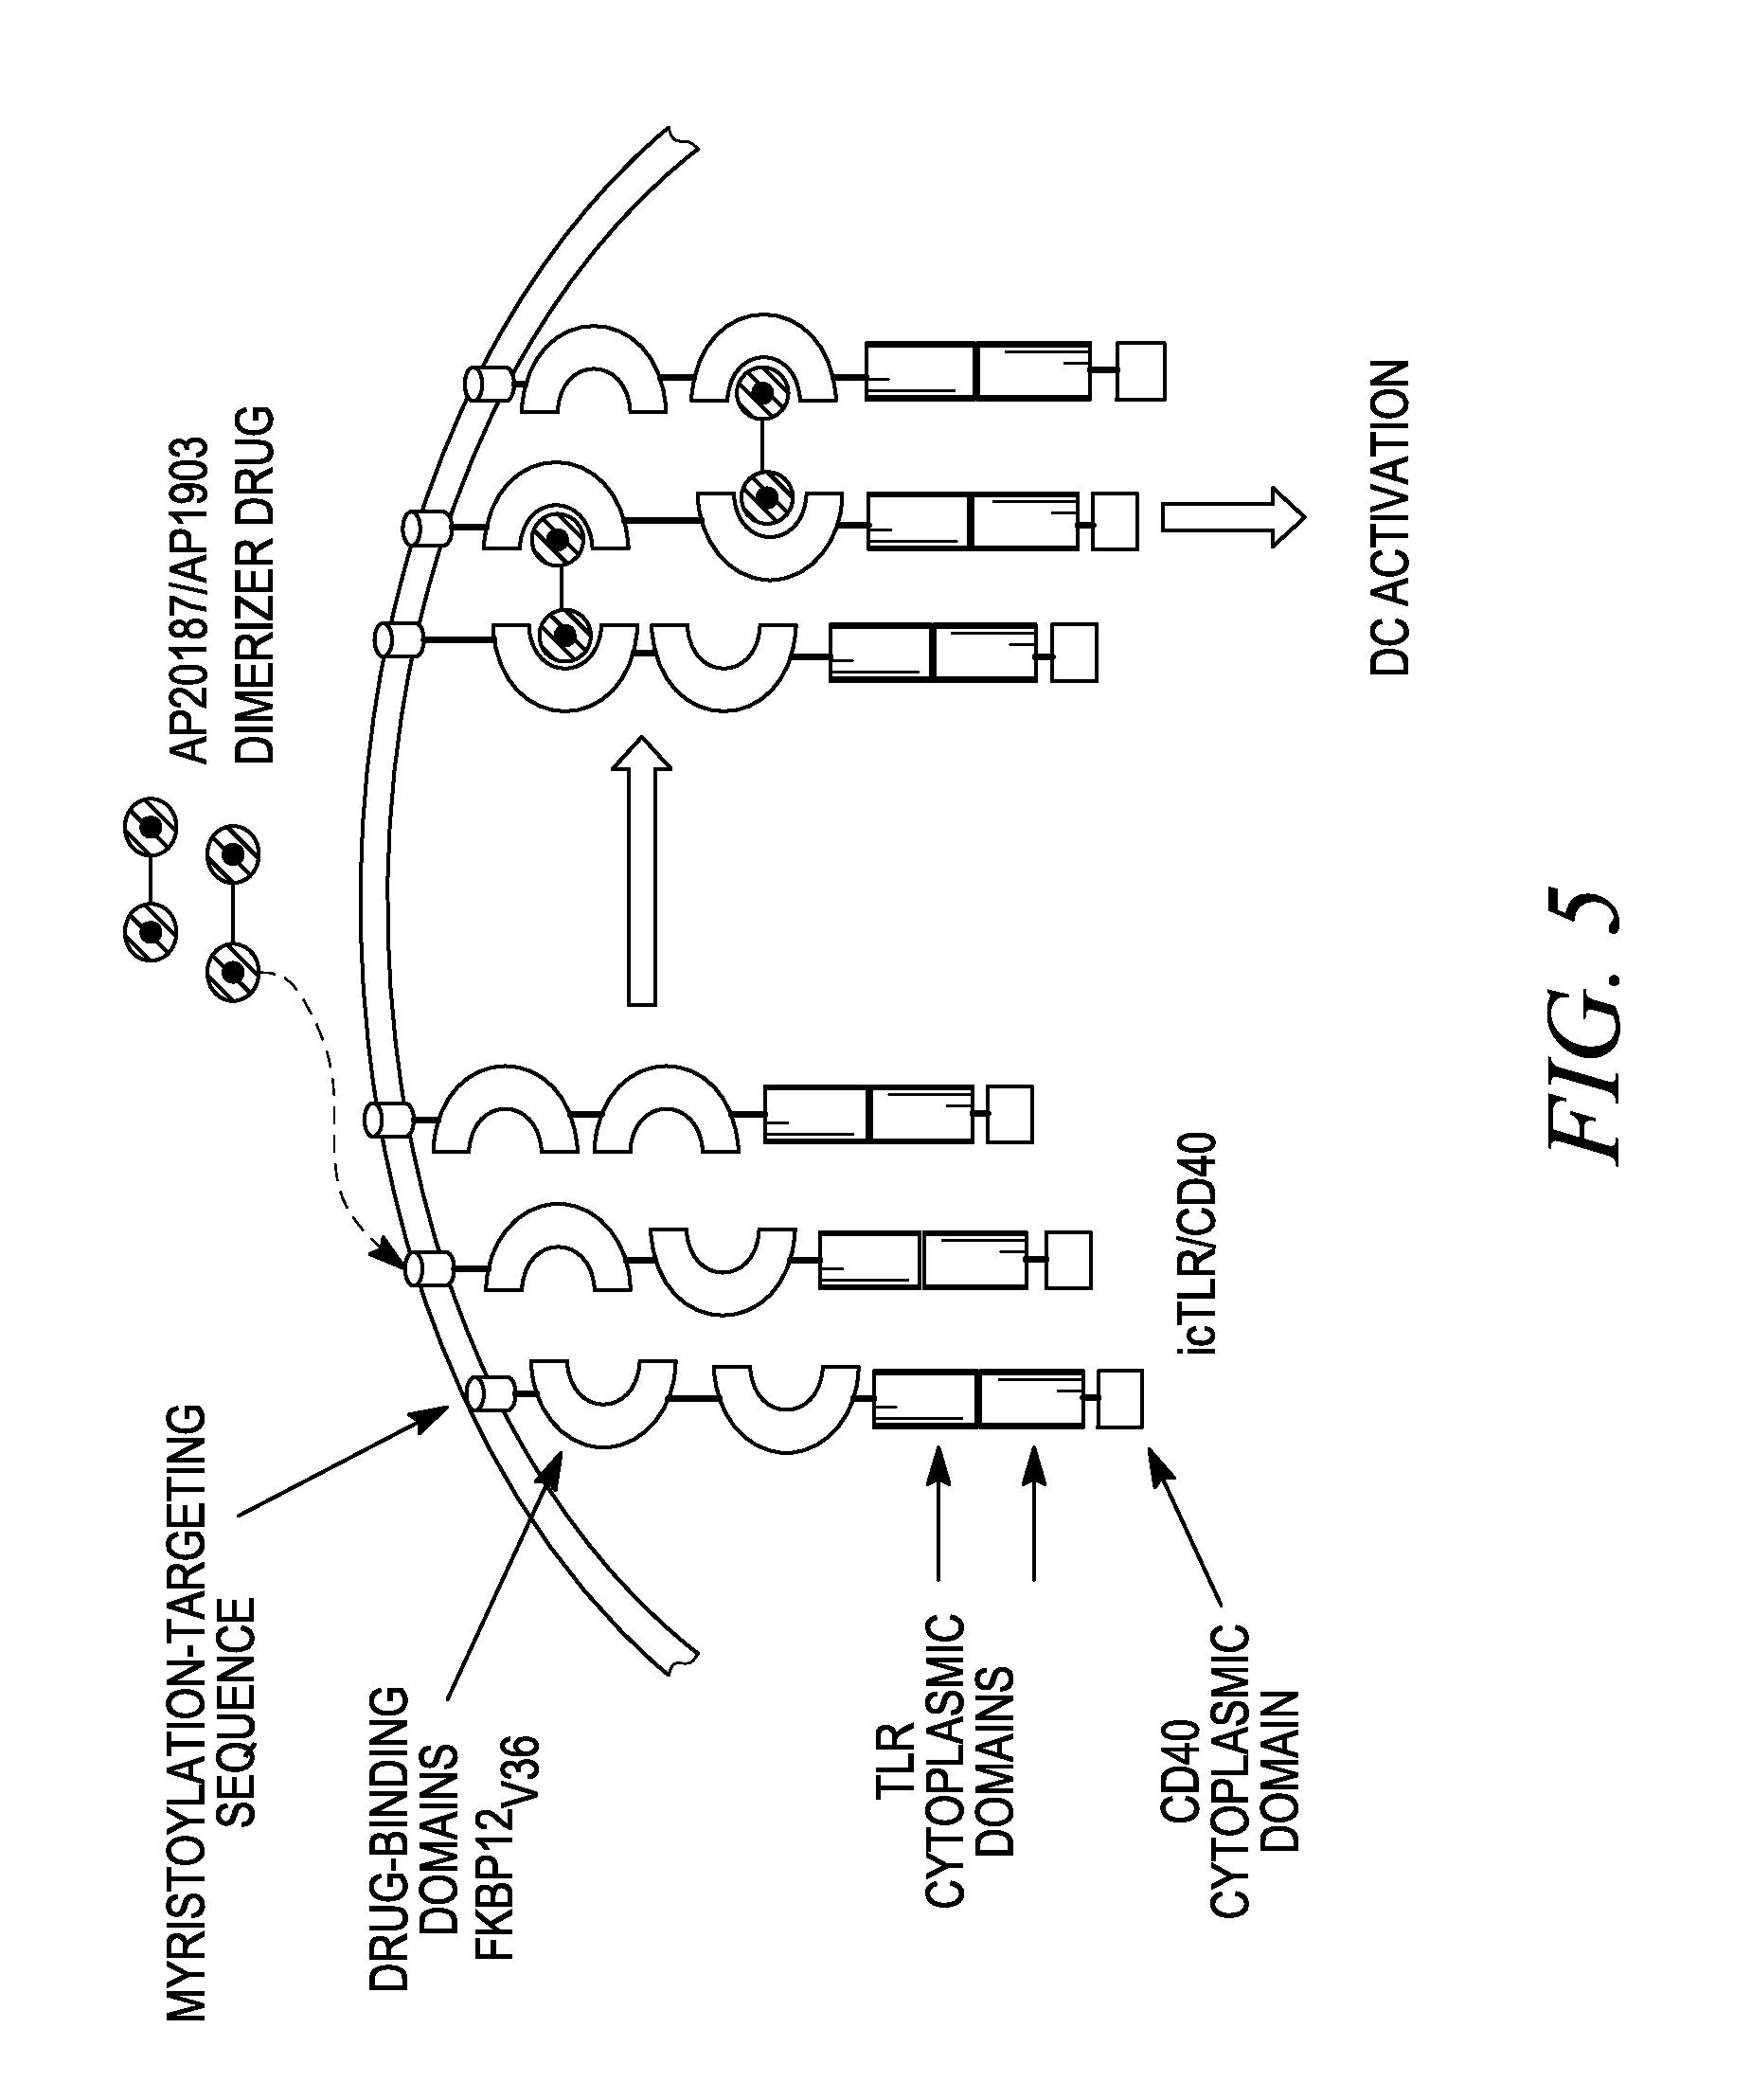 lexus ls400 fuse box diagram on 2007 toyota yaris fuse box diagram